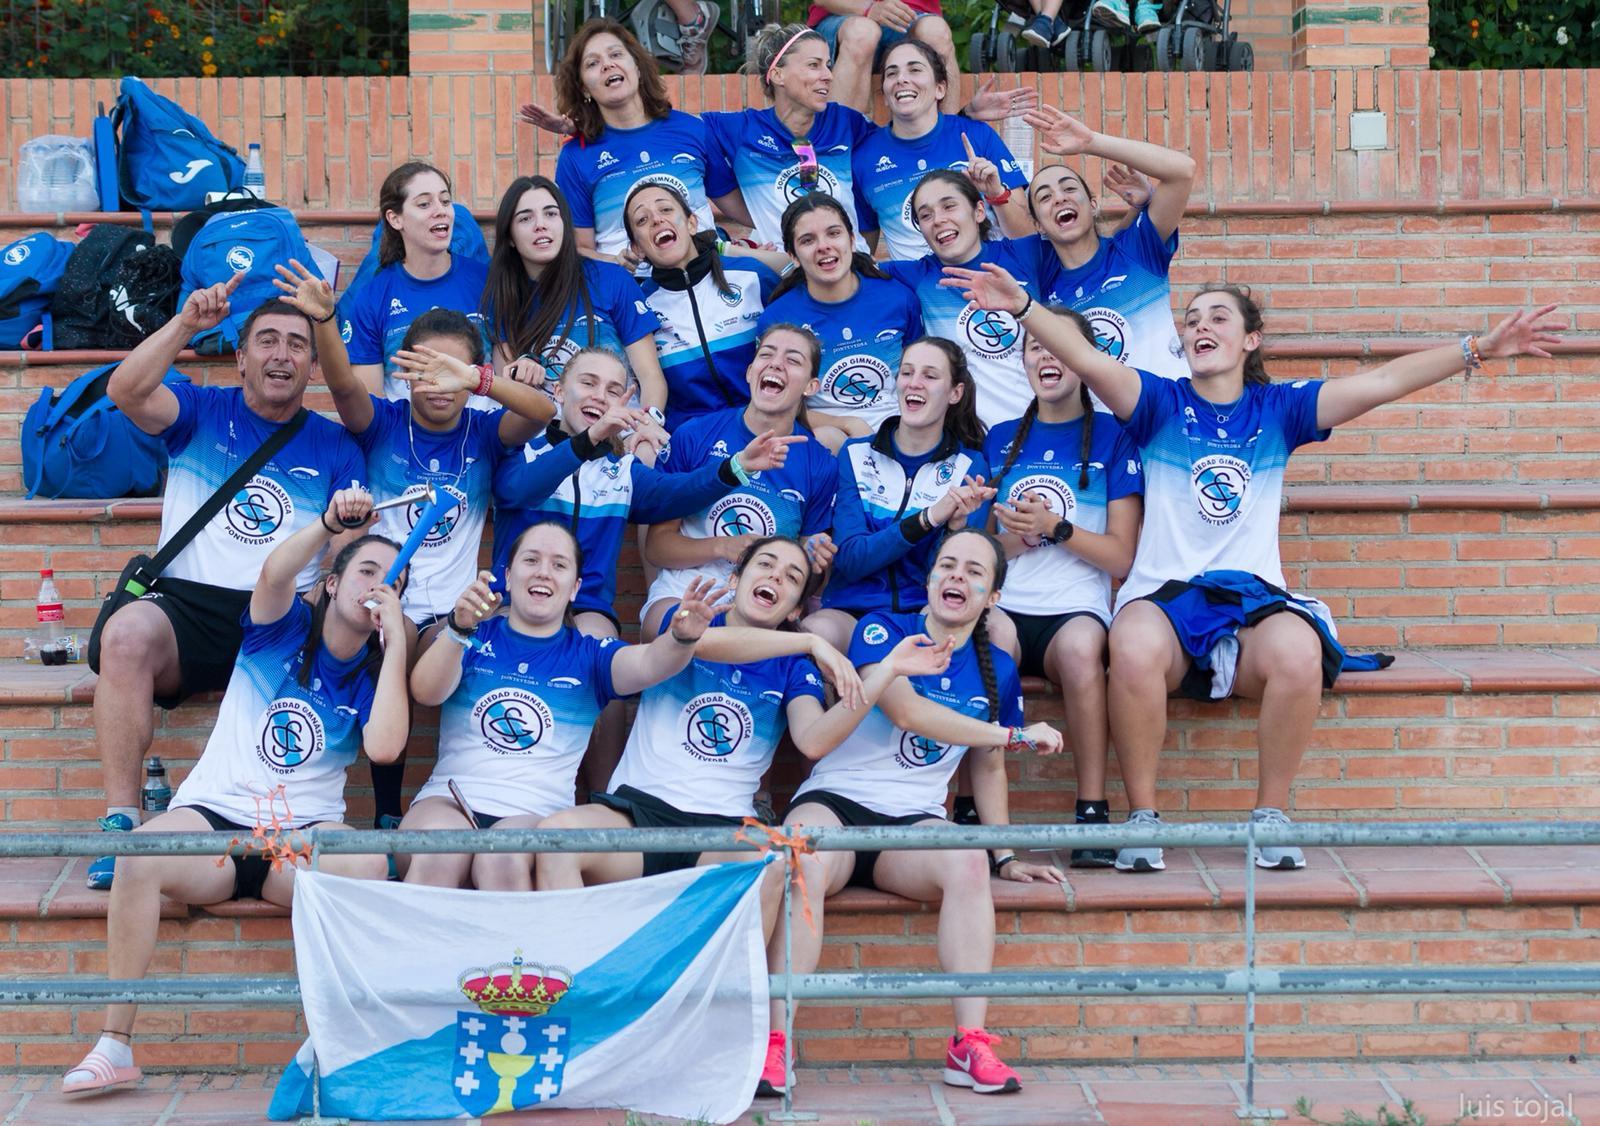 Equipo femenino en la última jornada de la Liga Iberdrola de la temporada pasada | Foto: Luis Tojal